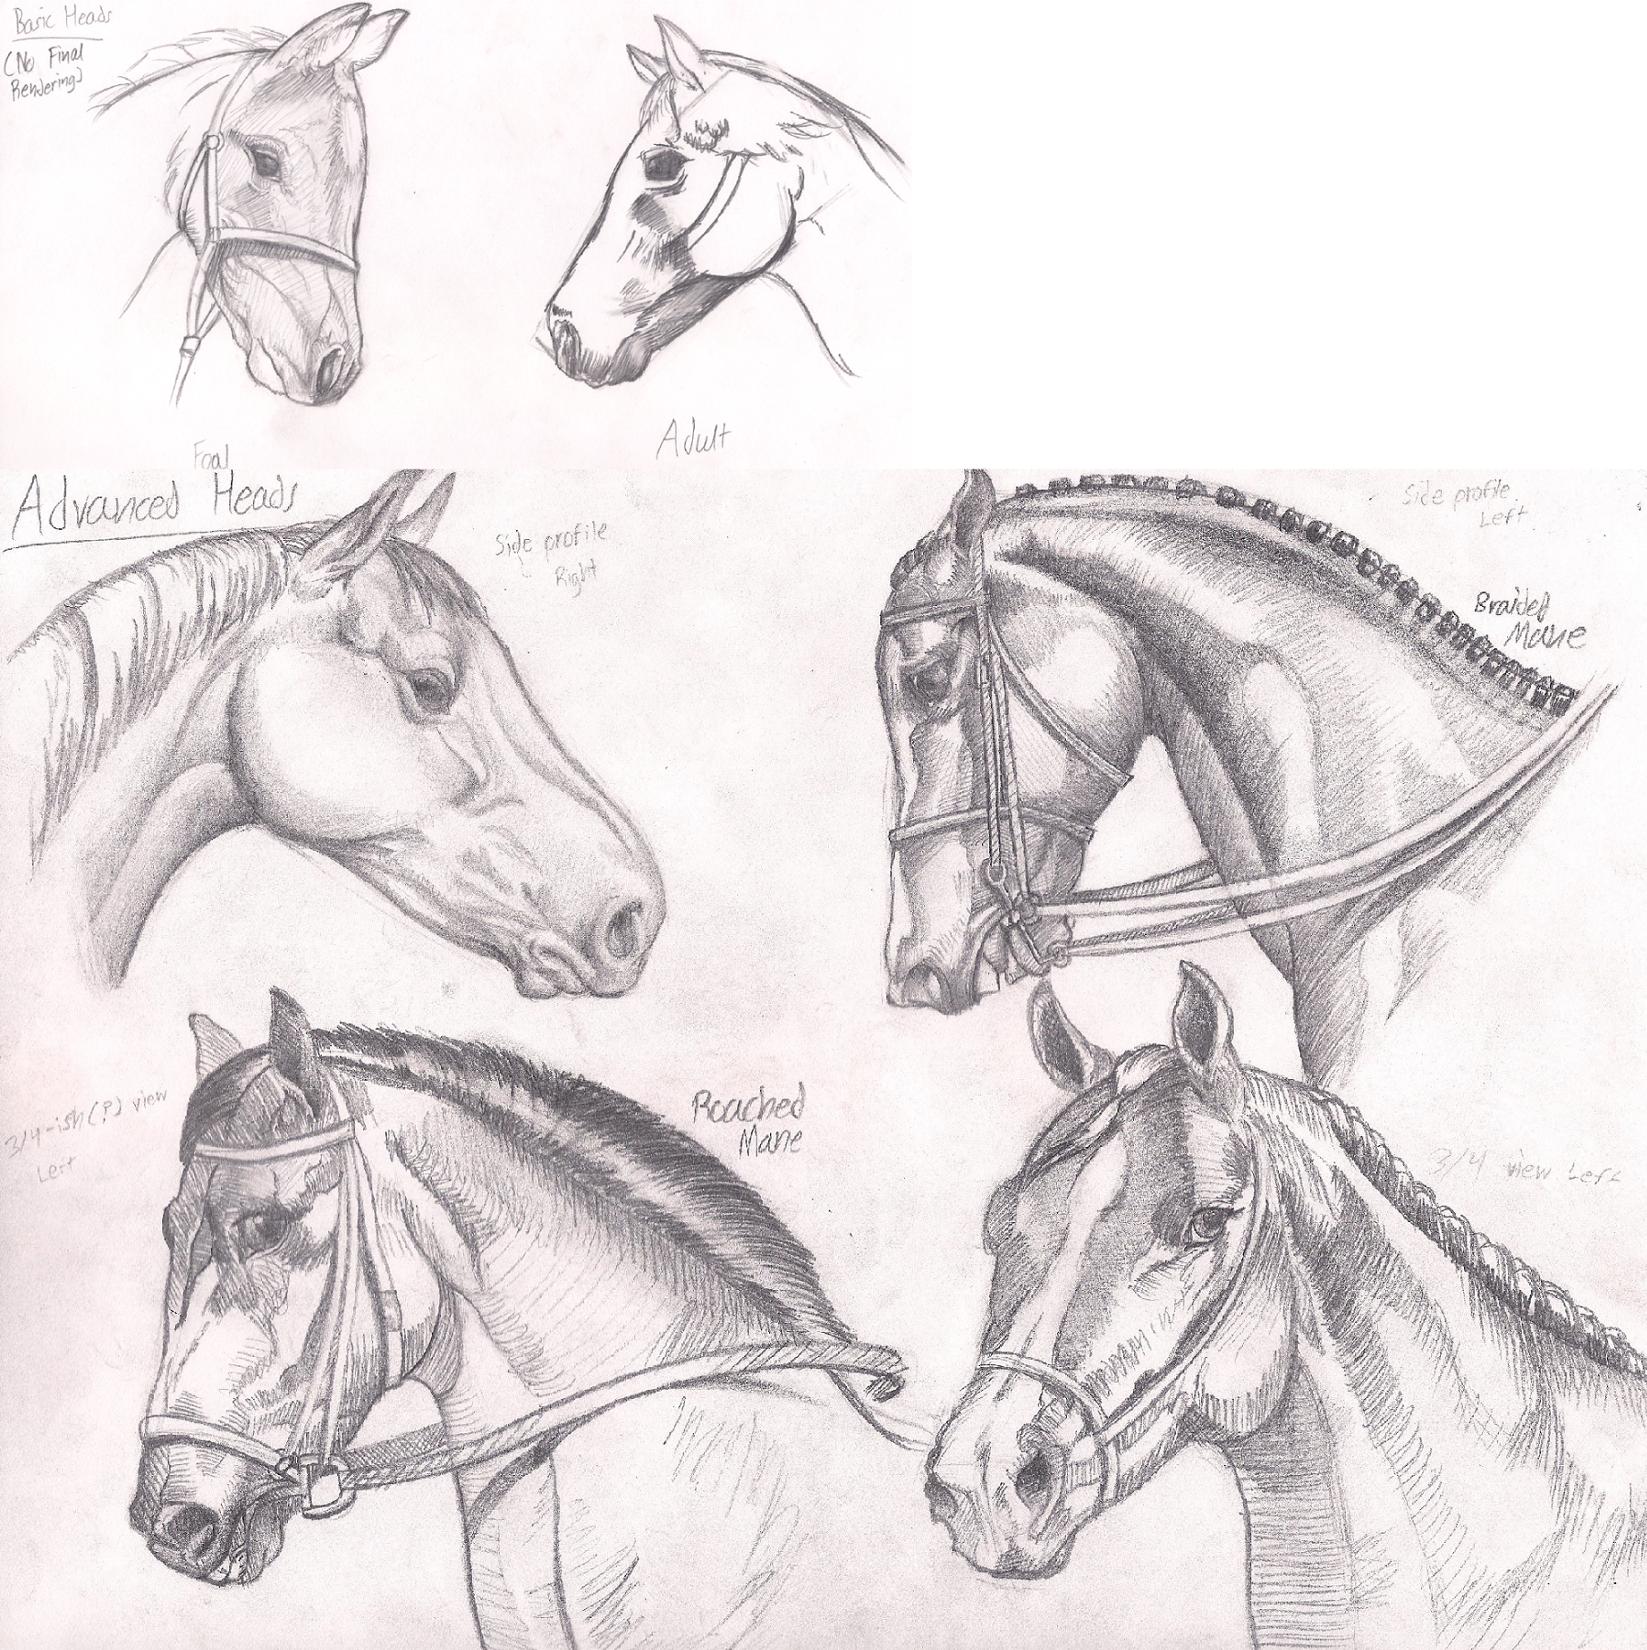 Horse Practice #4 (Heads) by Graboiidz